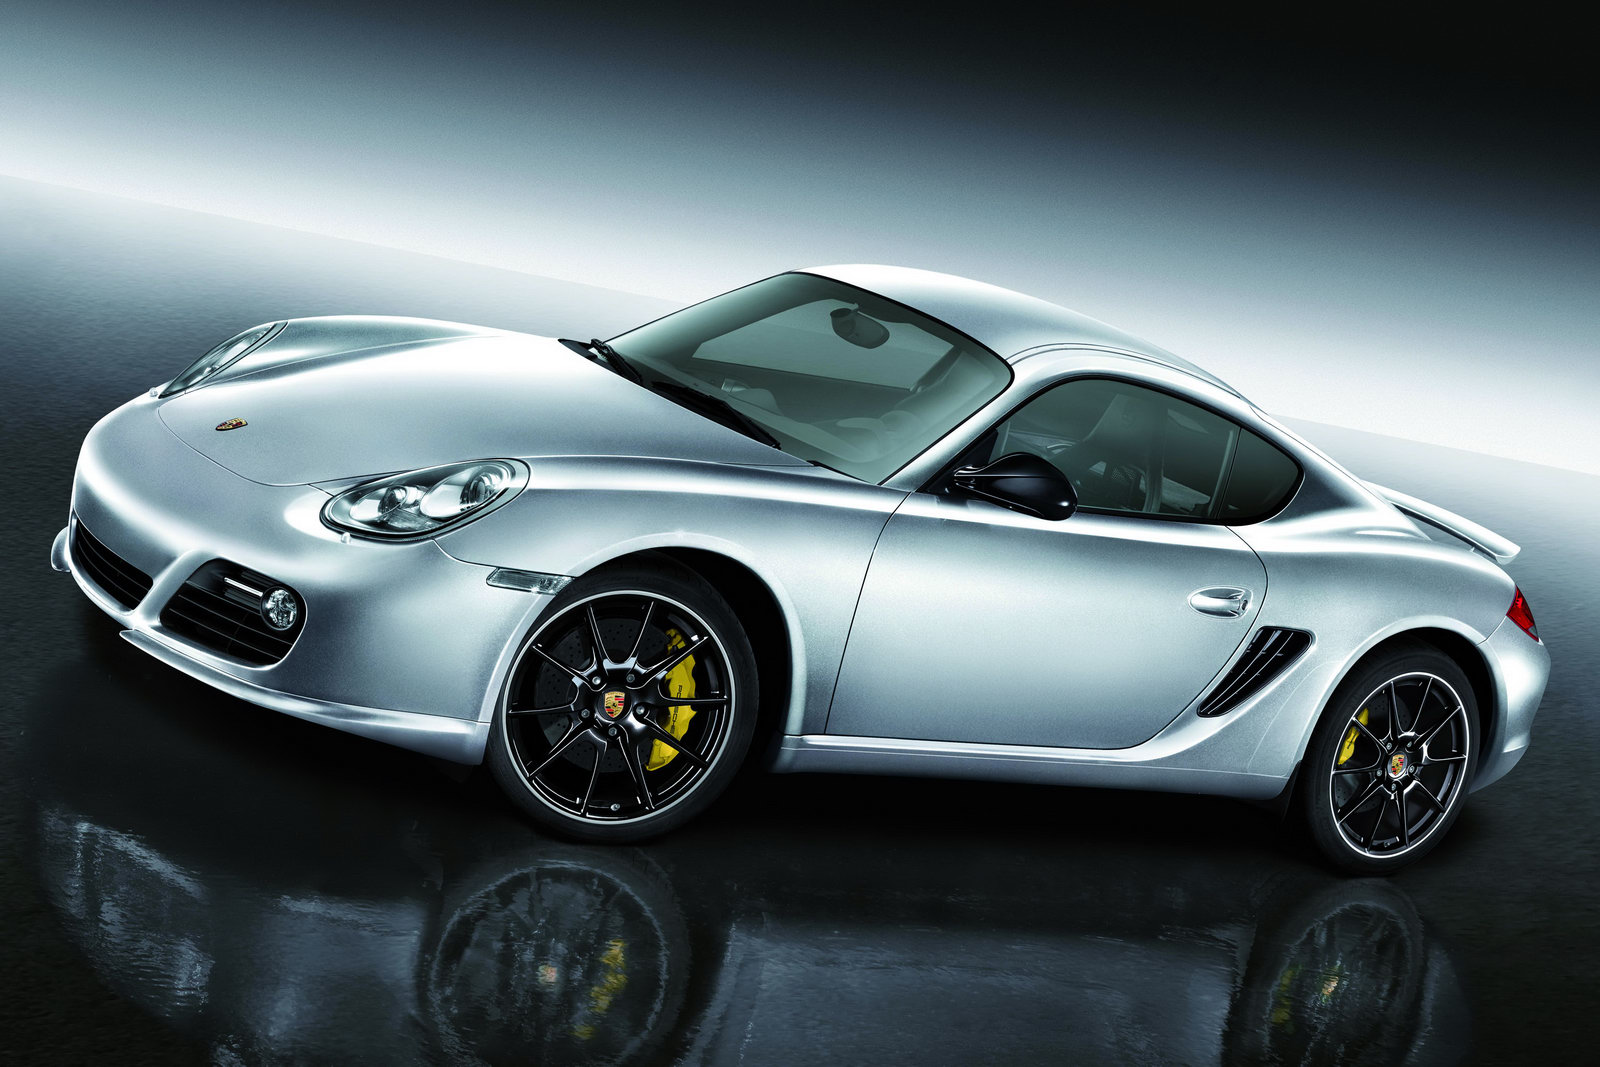 Best Car Models Amp All About Cars Porsche 2012 Cayman